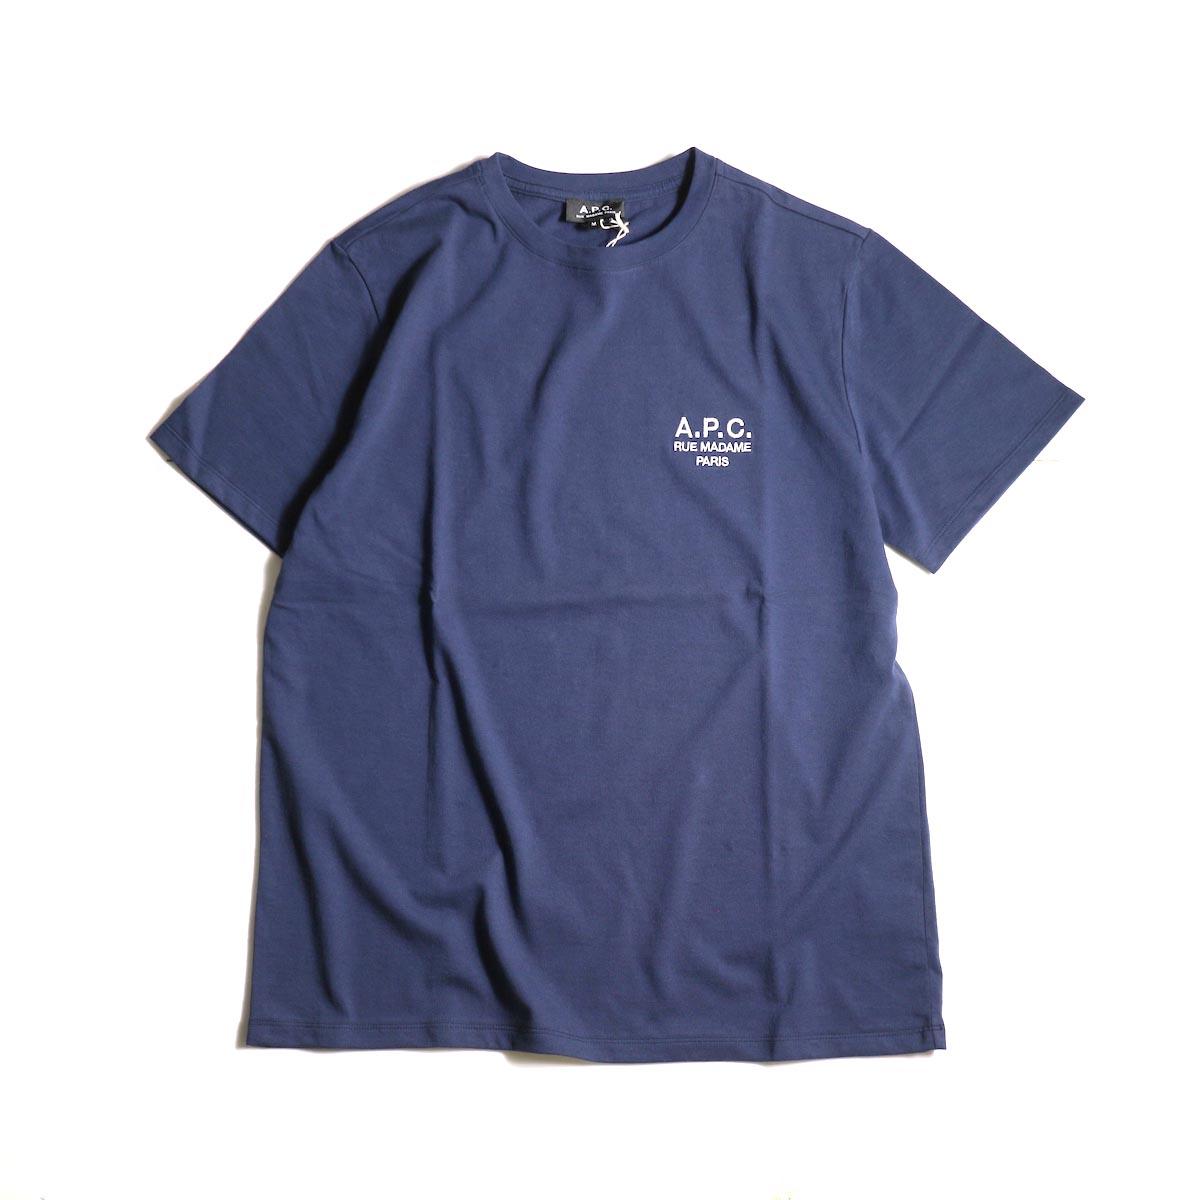 A.P.C. / Crew Neck Tee (Raymond T-shirt) -Navy正面